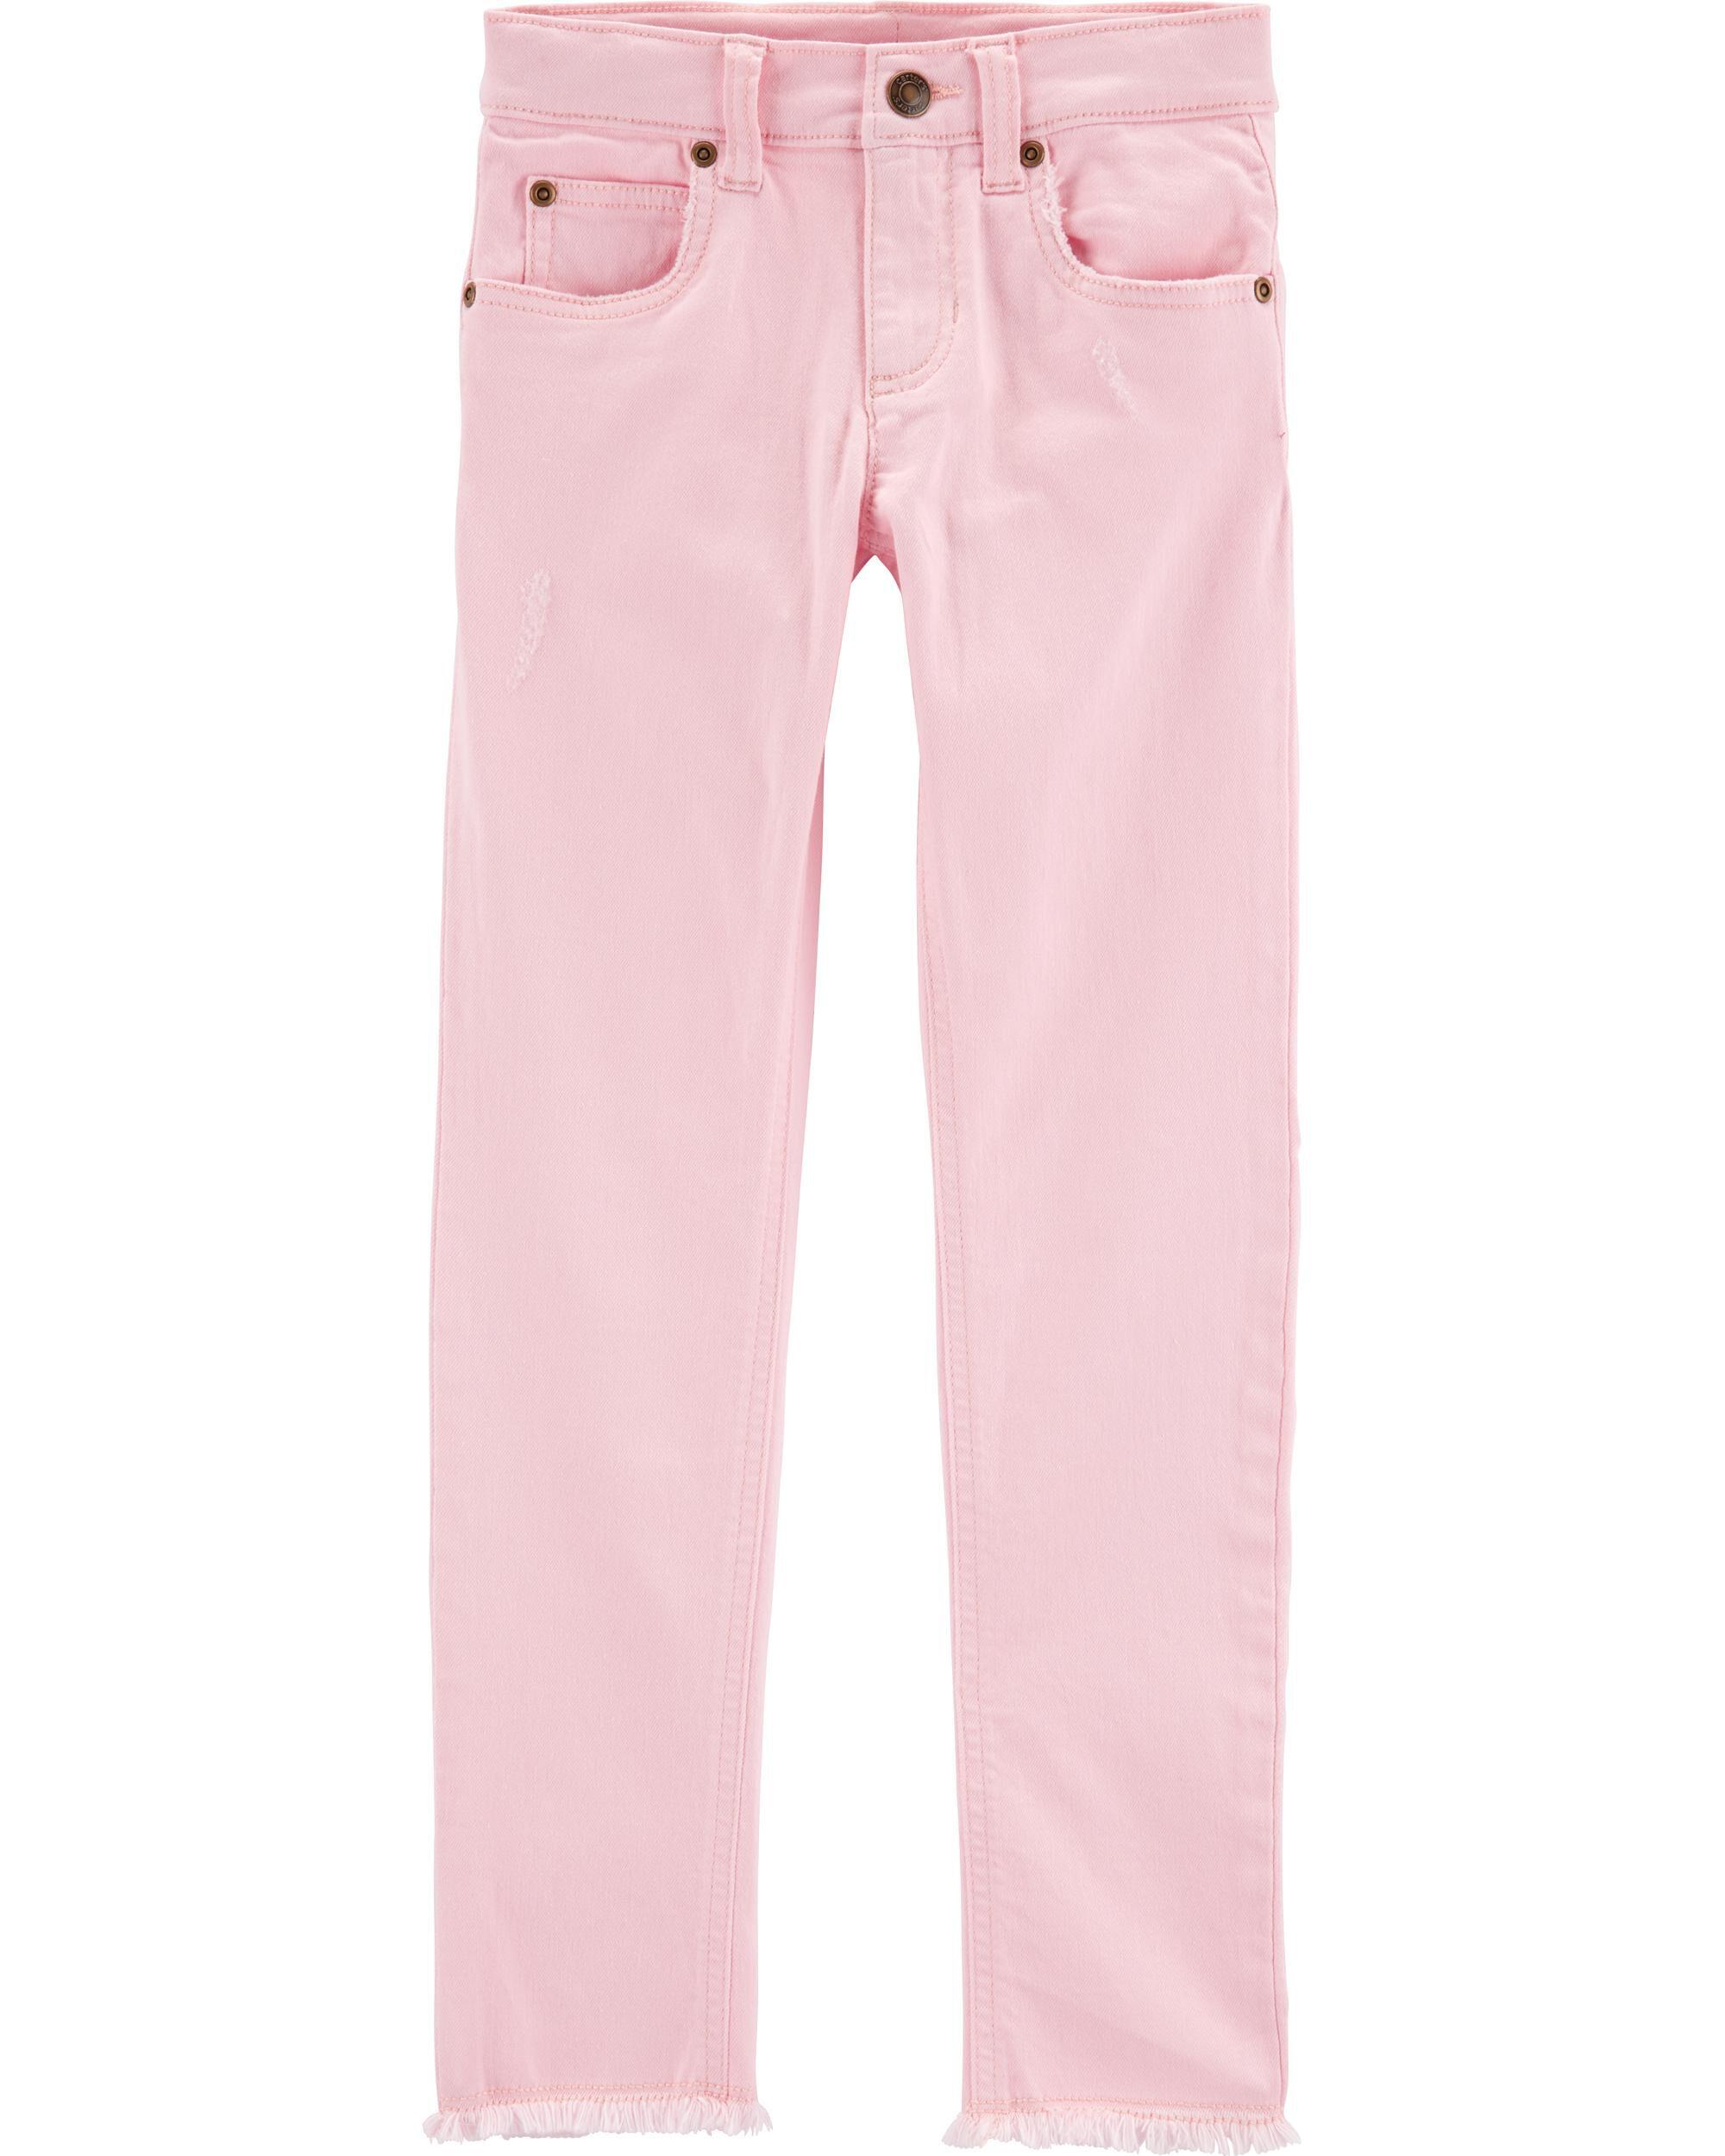 *Clearance*  5-Pocket Twill Pants